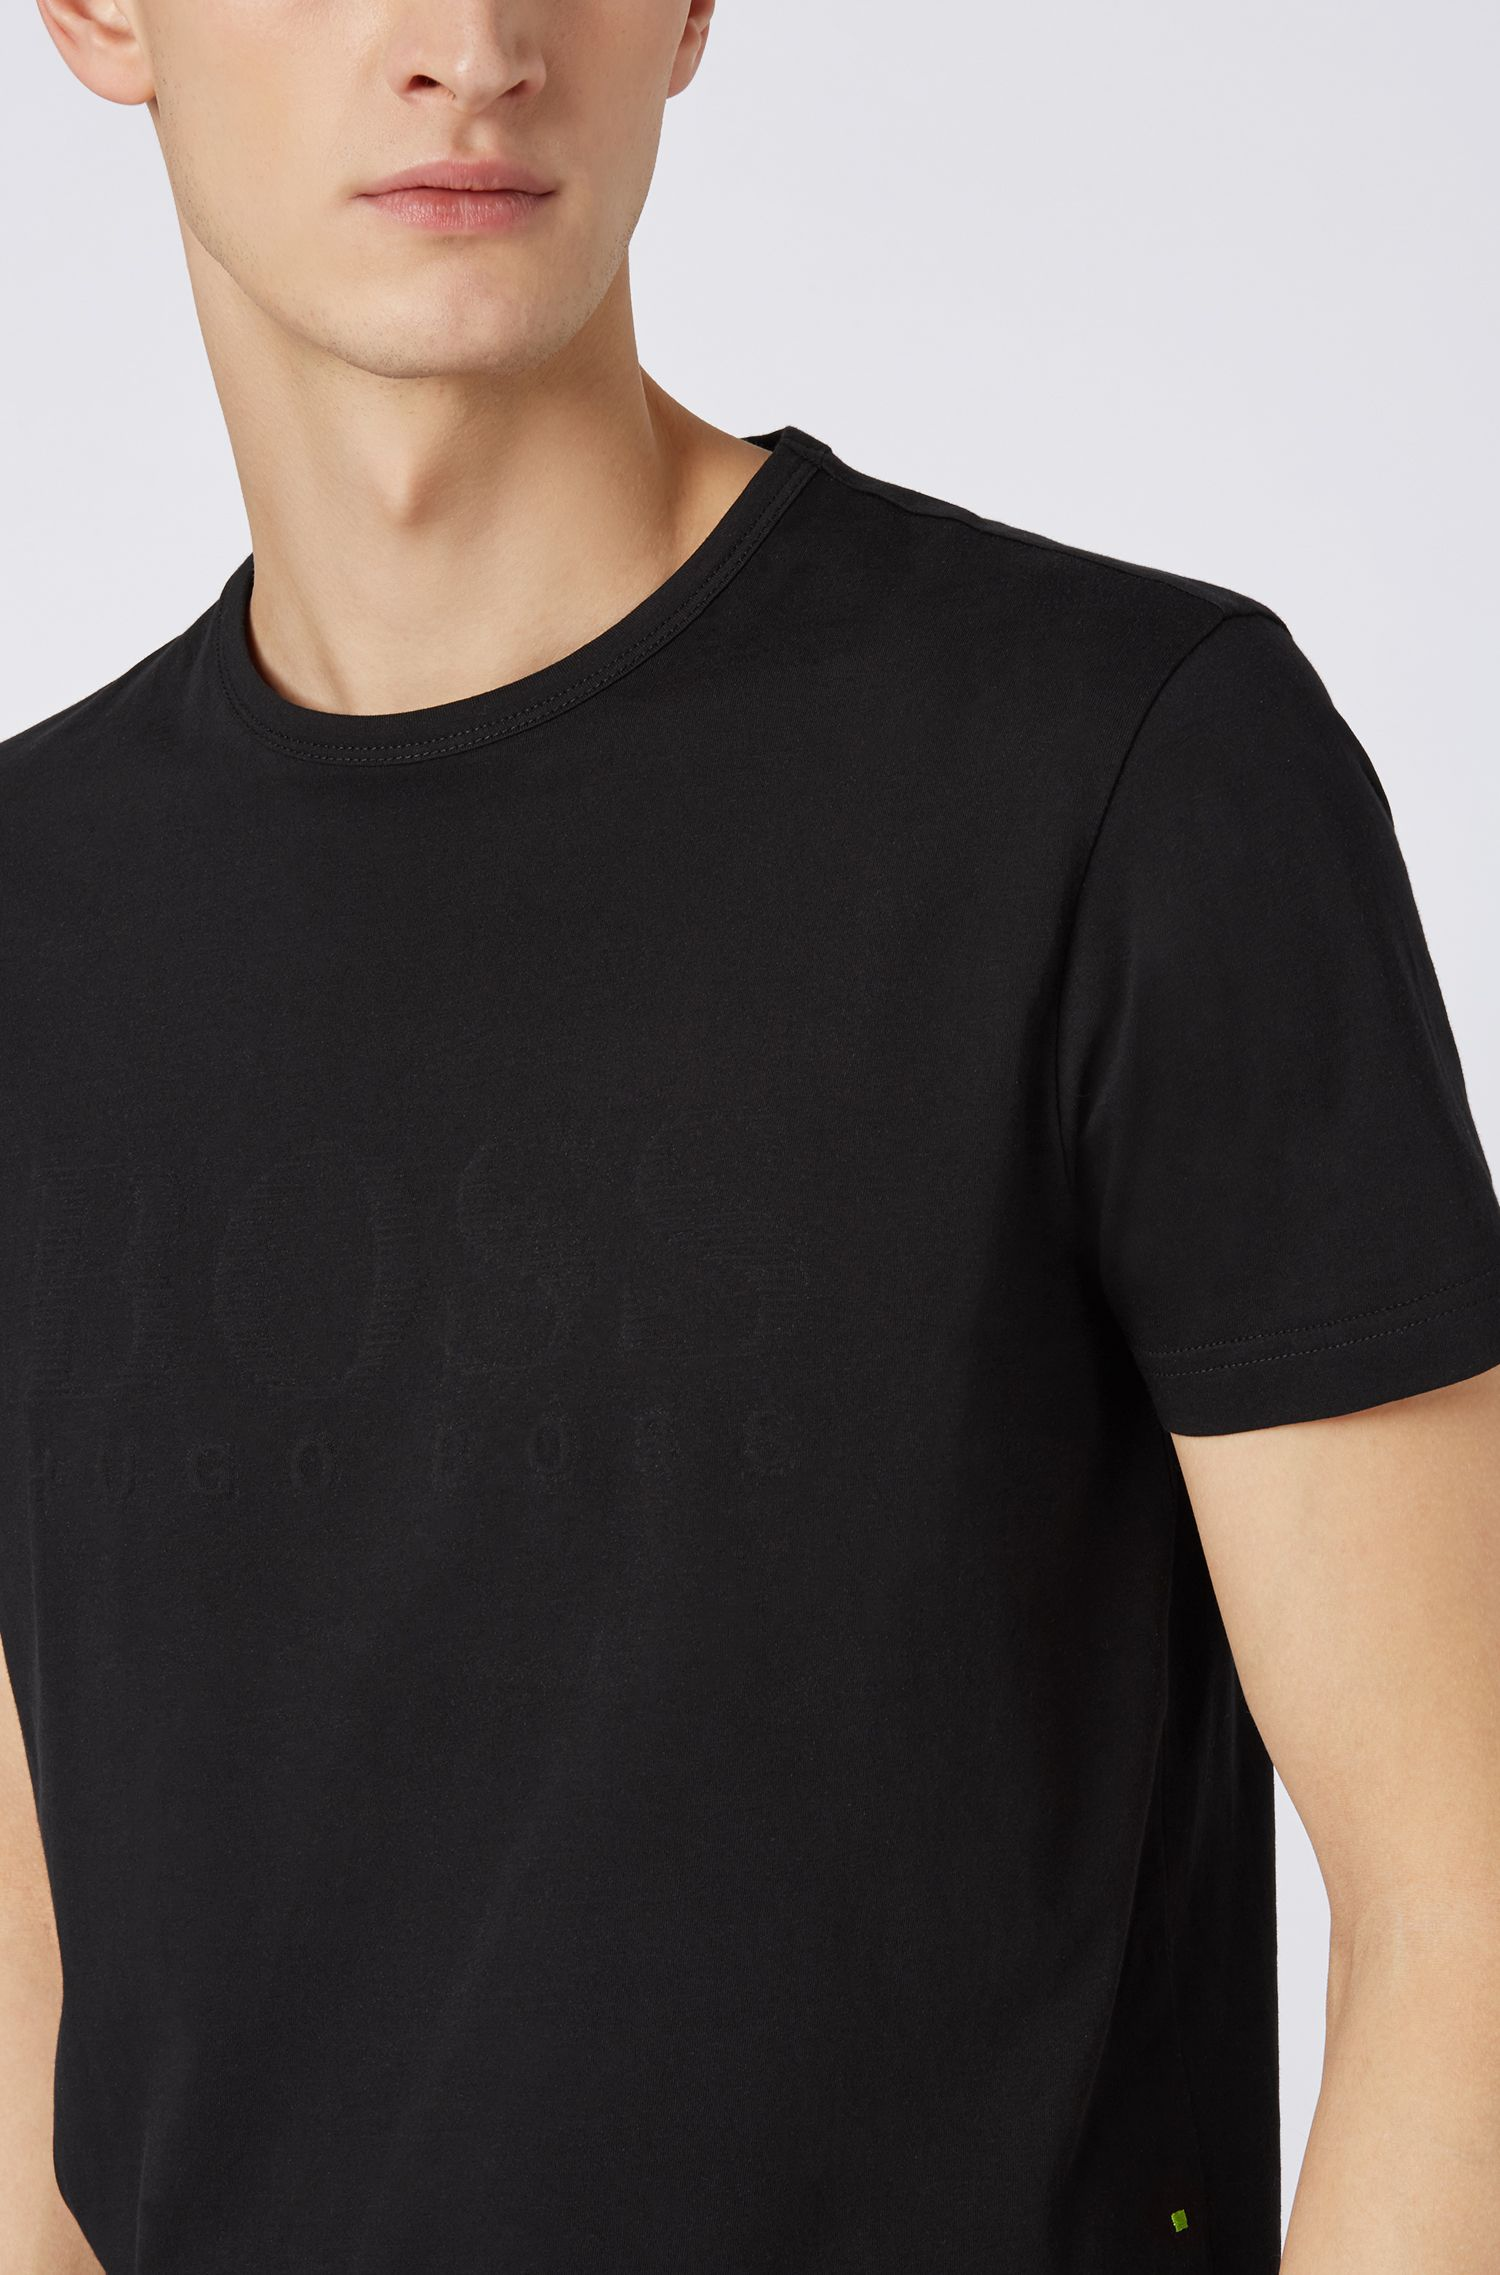 Cotton T-shirt with tonal logo print, Black